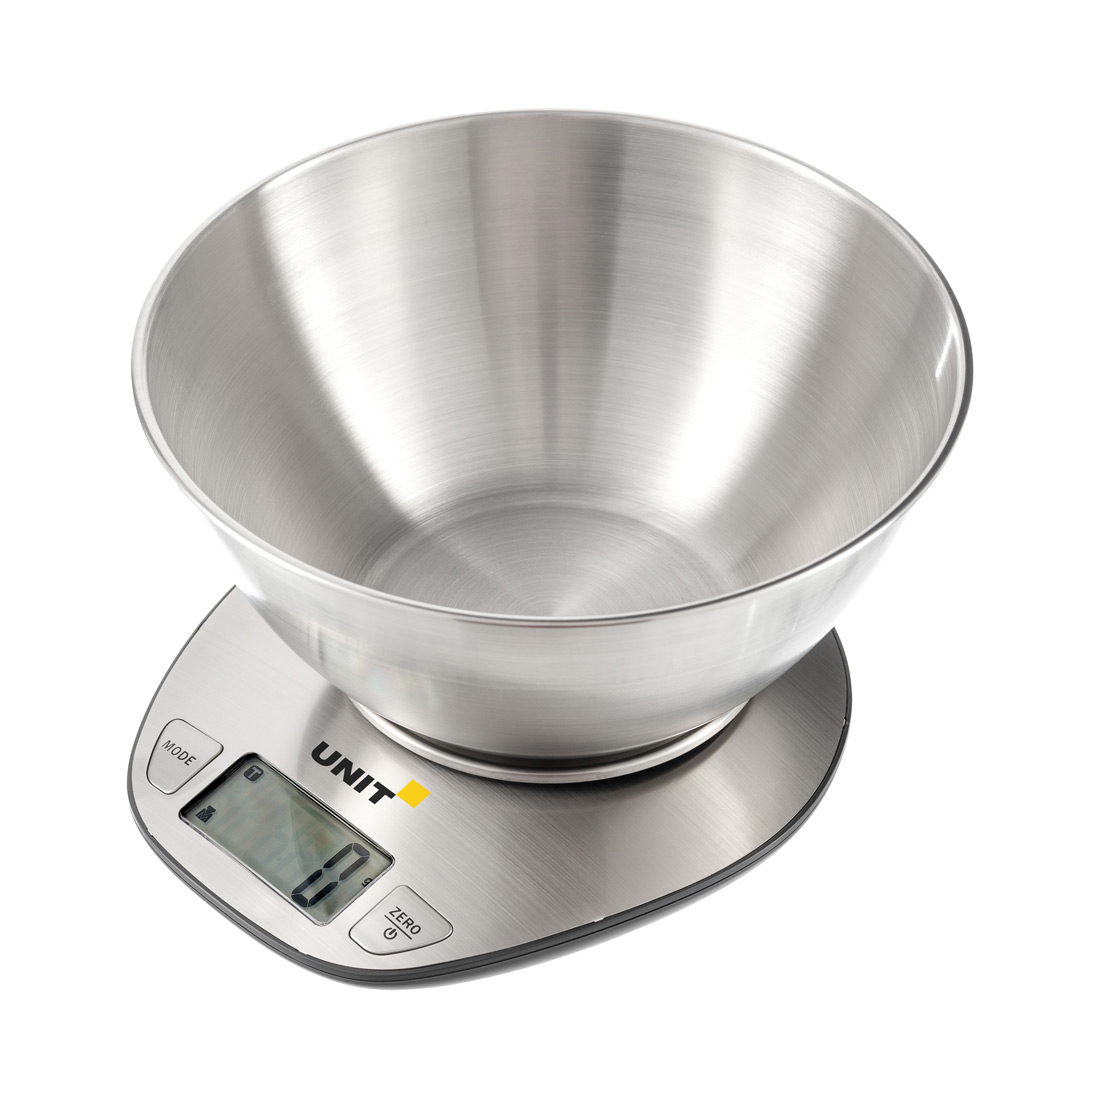 Весы Кухонные электронные UNIT UBS-2153 весы кухонные unit ubs 2150